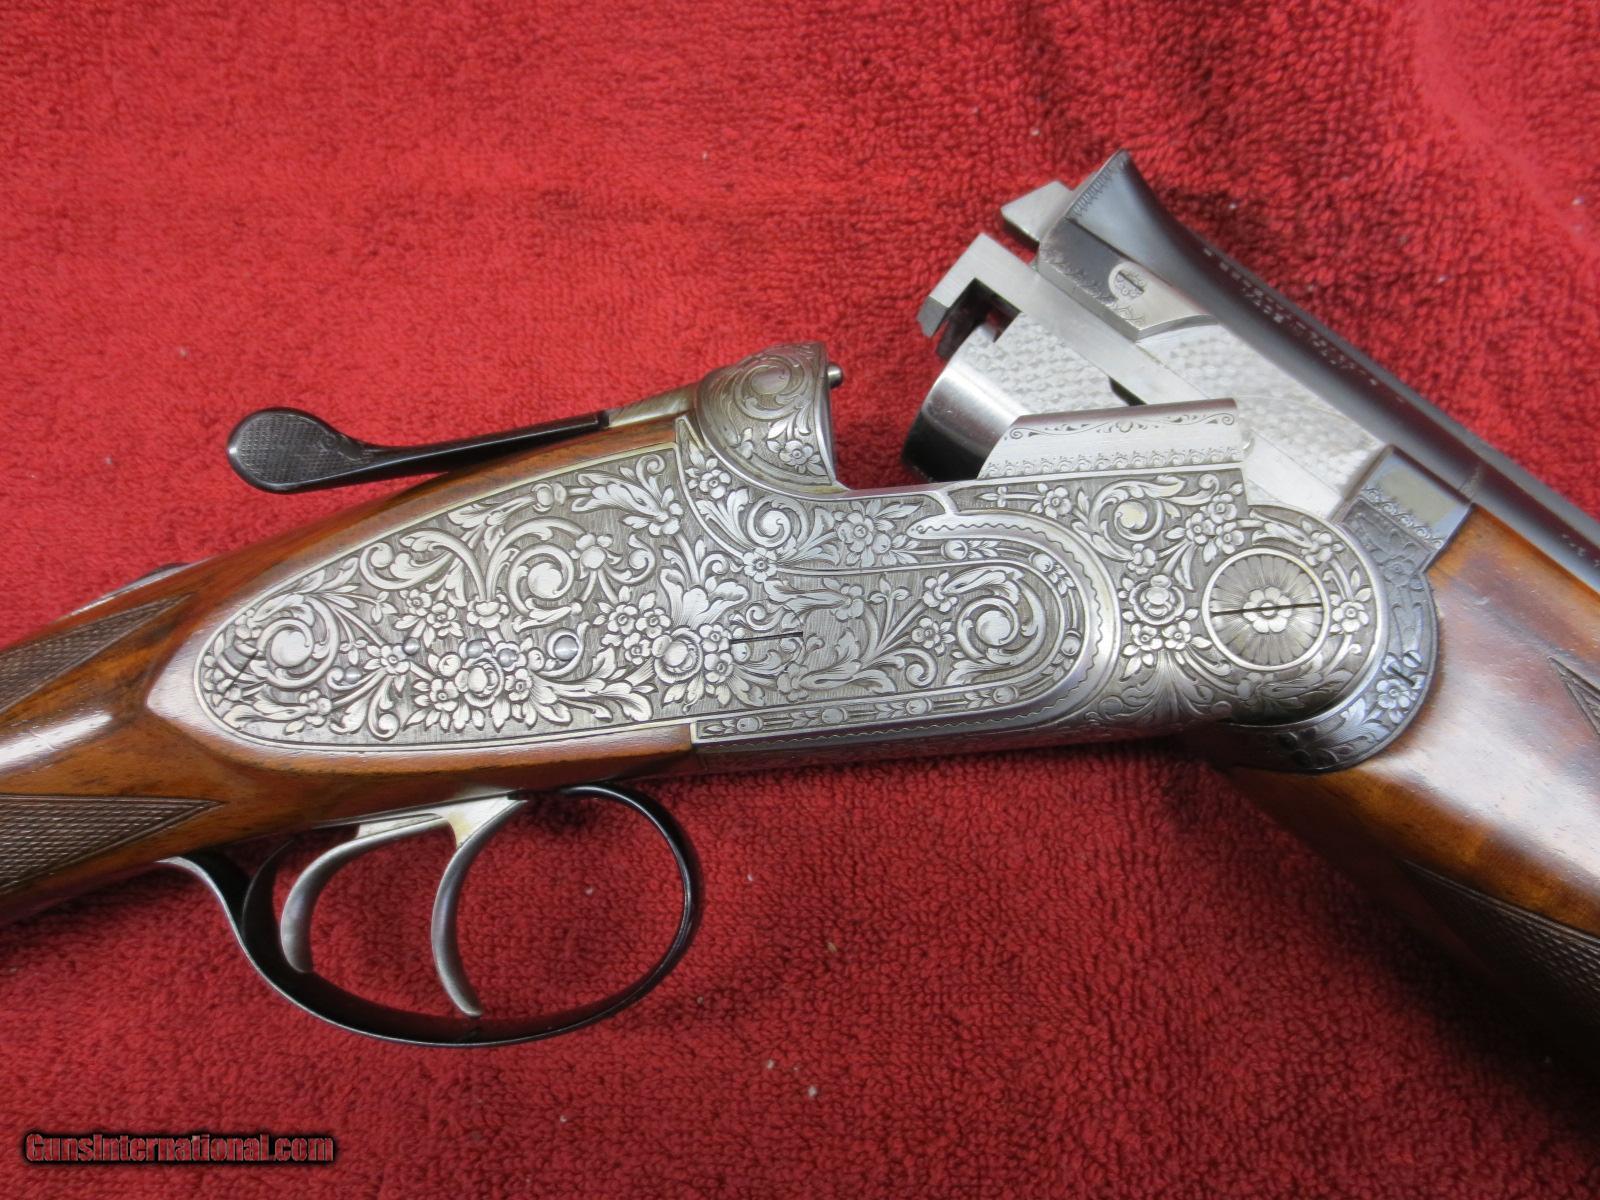 Beretta 12ga, SO4 Pedersoli engraved